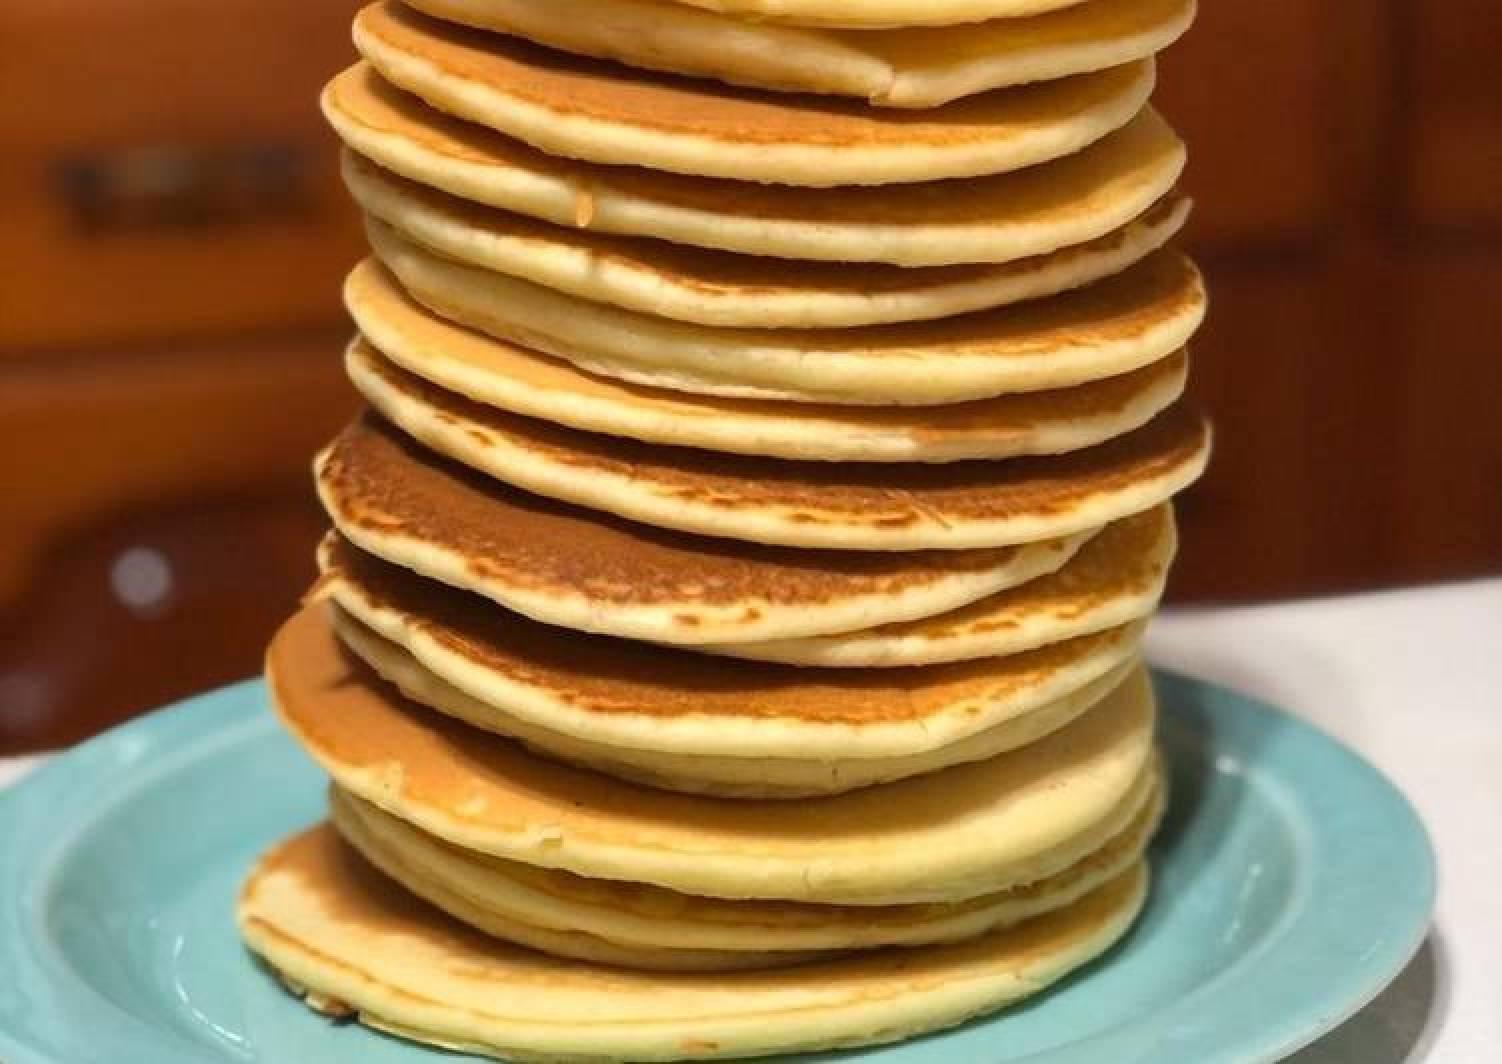 Pancakes (modified)